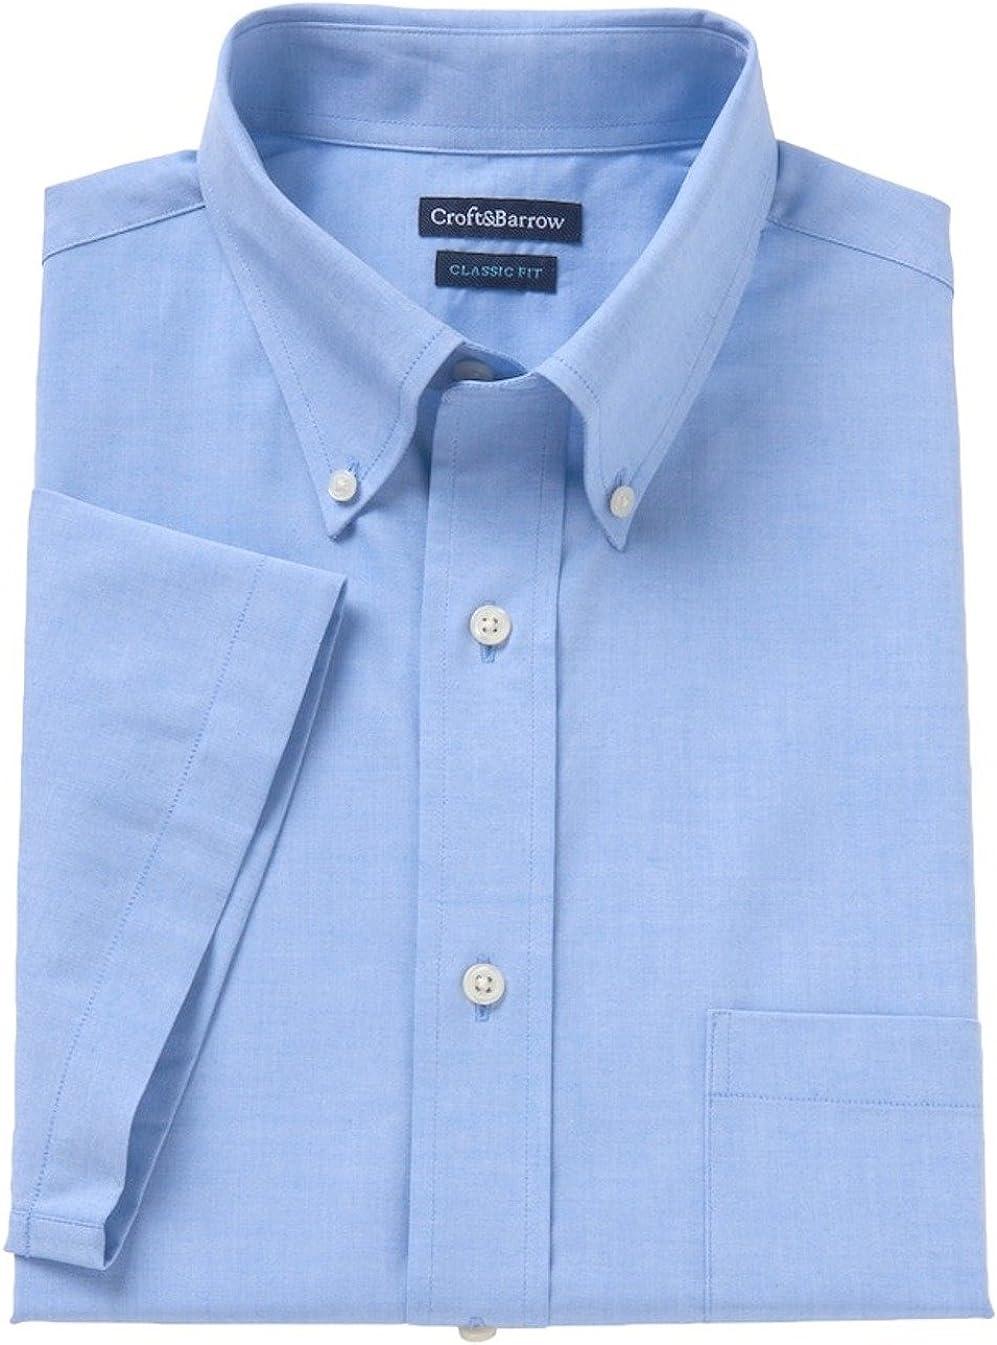 Croft & Barrow Mens Classic Fit Short Sleeve Dress Shirt Palace Blue